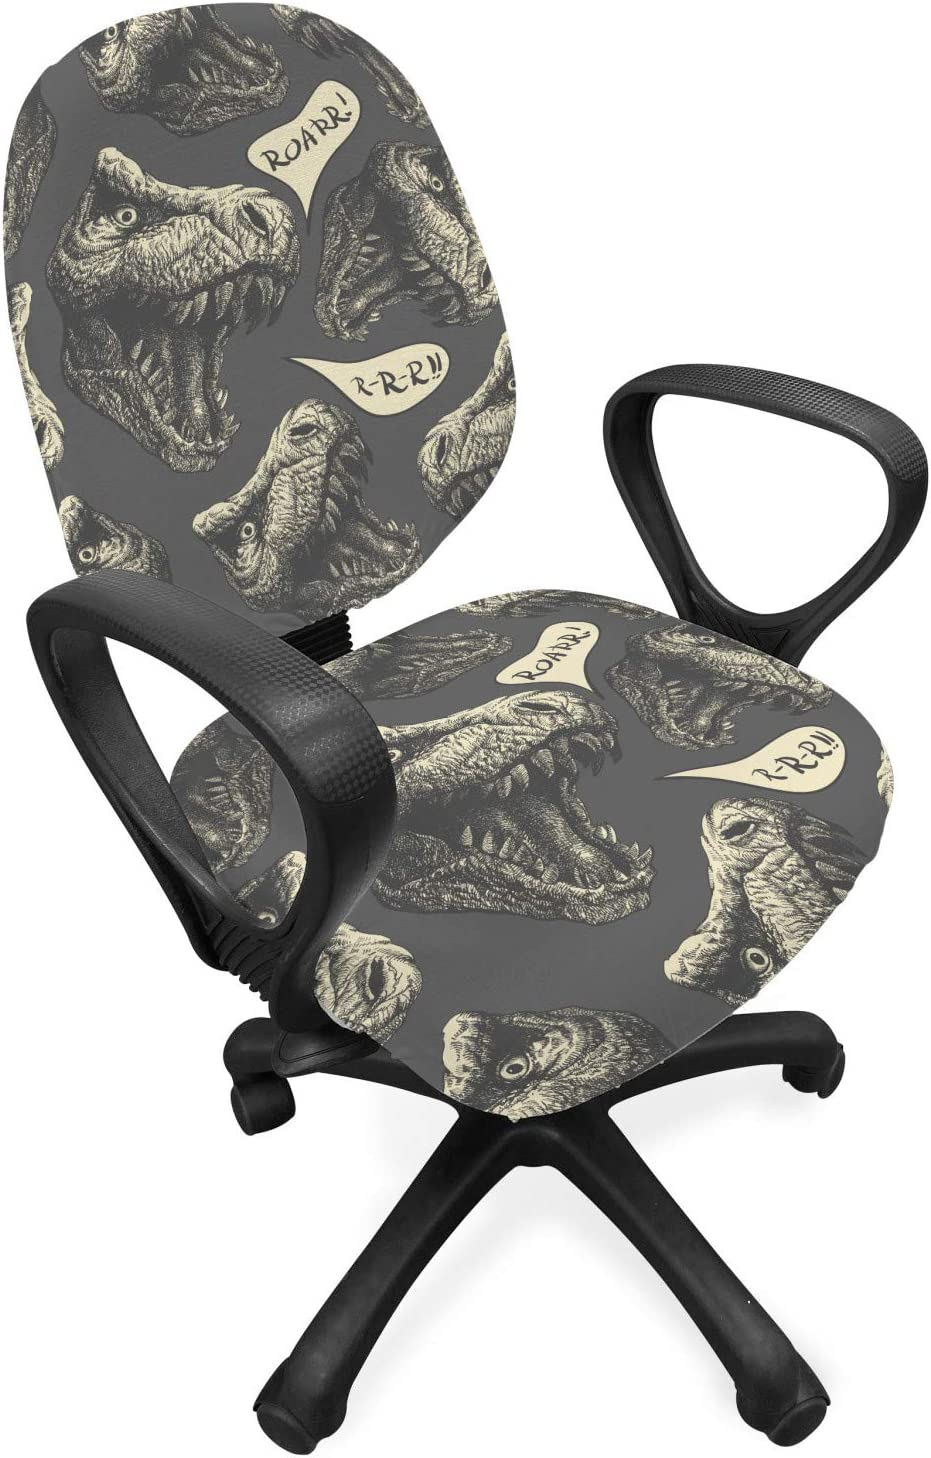 Lunarable Jurassic Office Chair Slipcover, Dinosaur Cartoon Tyrannosaurus Paleontology Animals Illustration, Protective Stretch Decorative Fabric Cover, Standard Size, Charcoal Grey